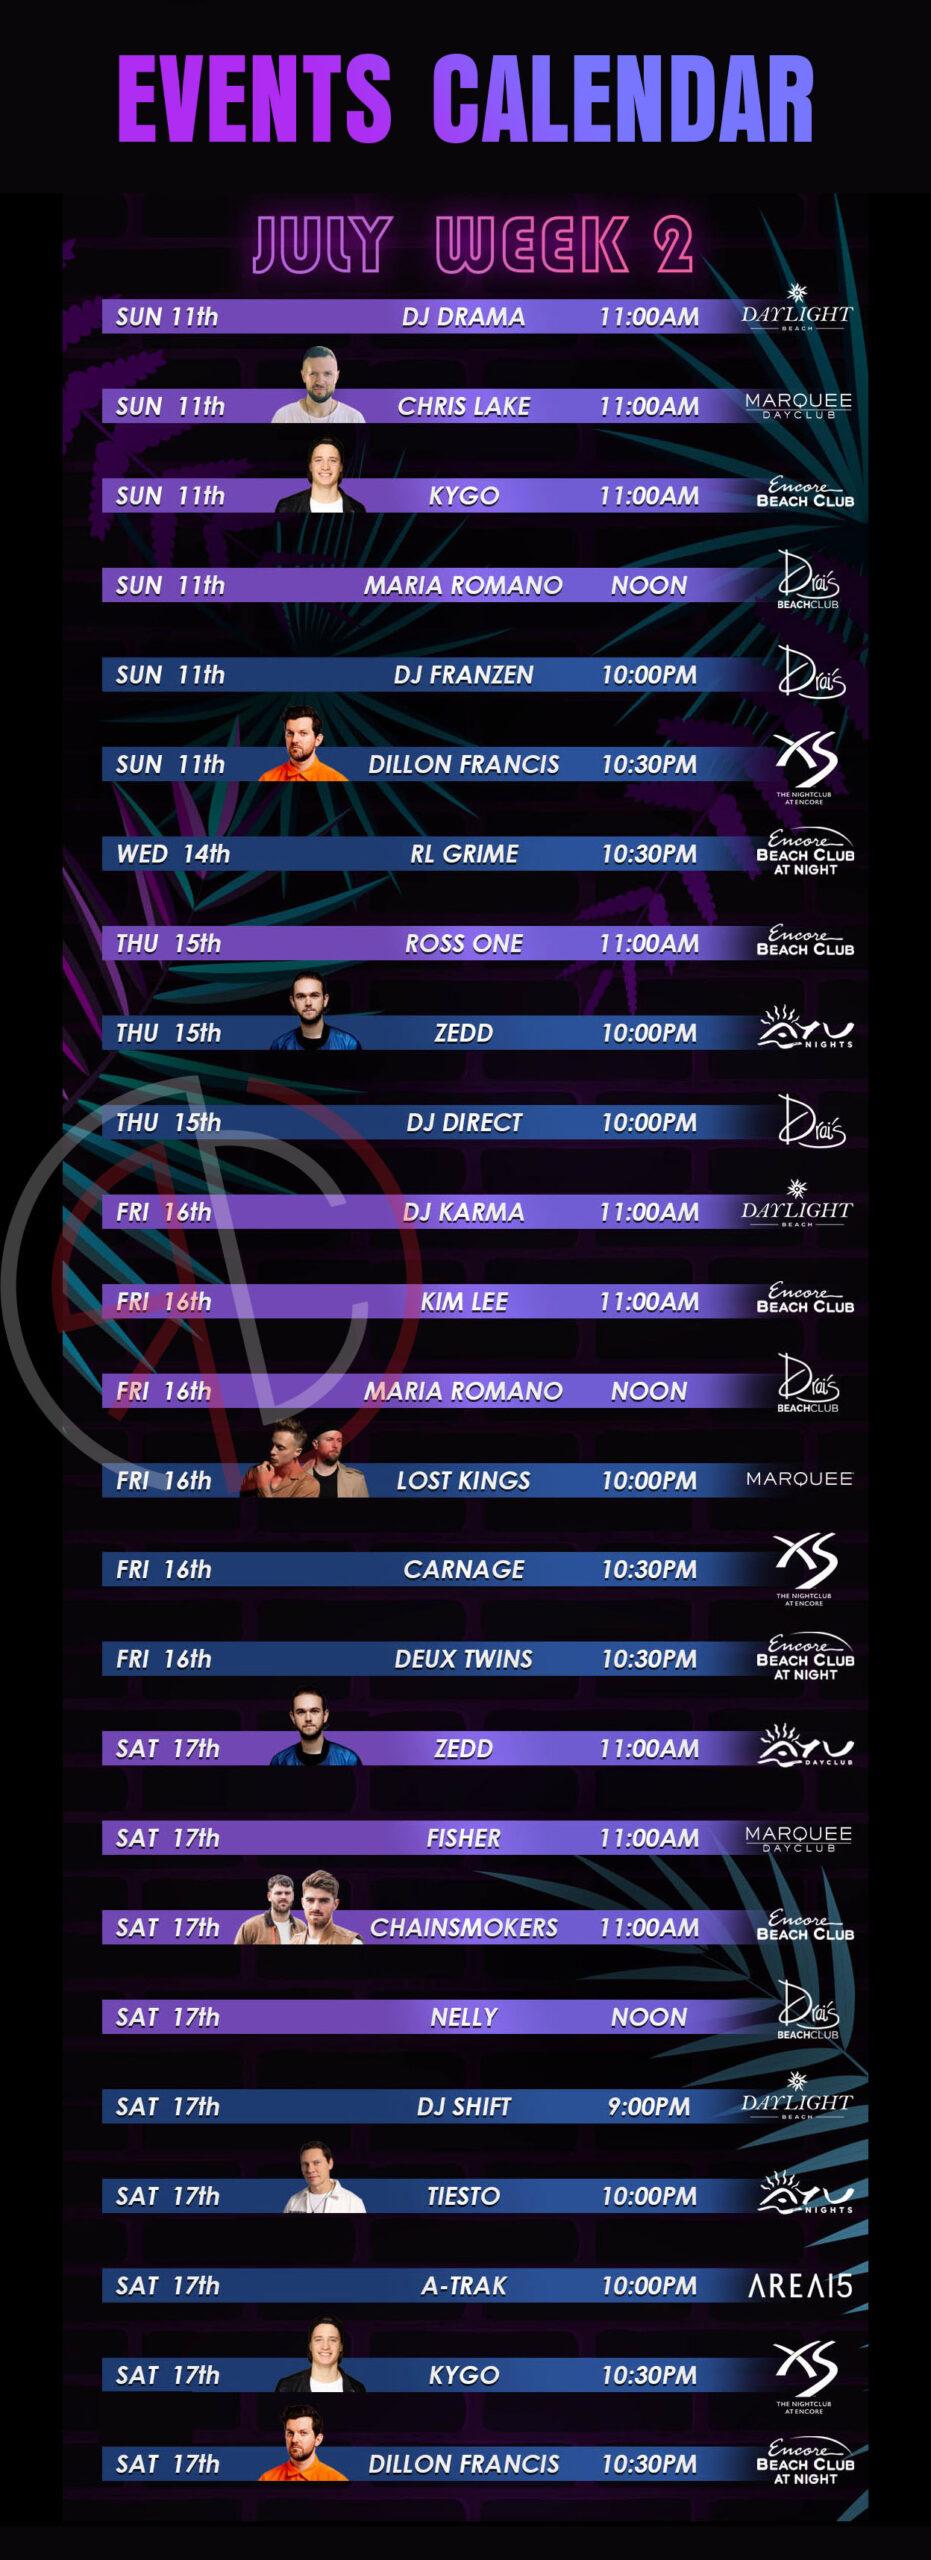 las vegas nightclub and dayclub july 2021 week 2 events calendar